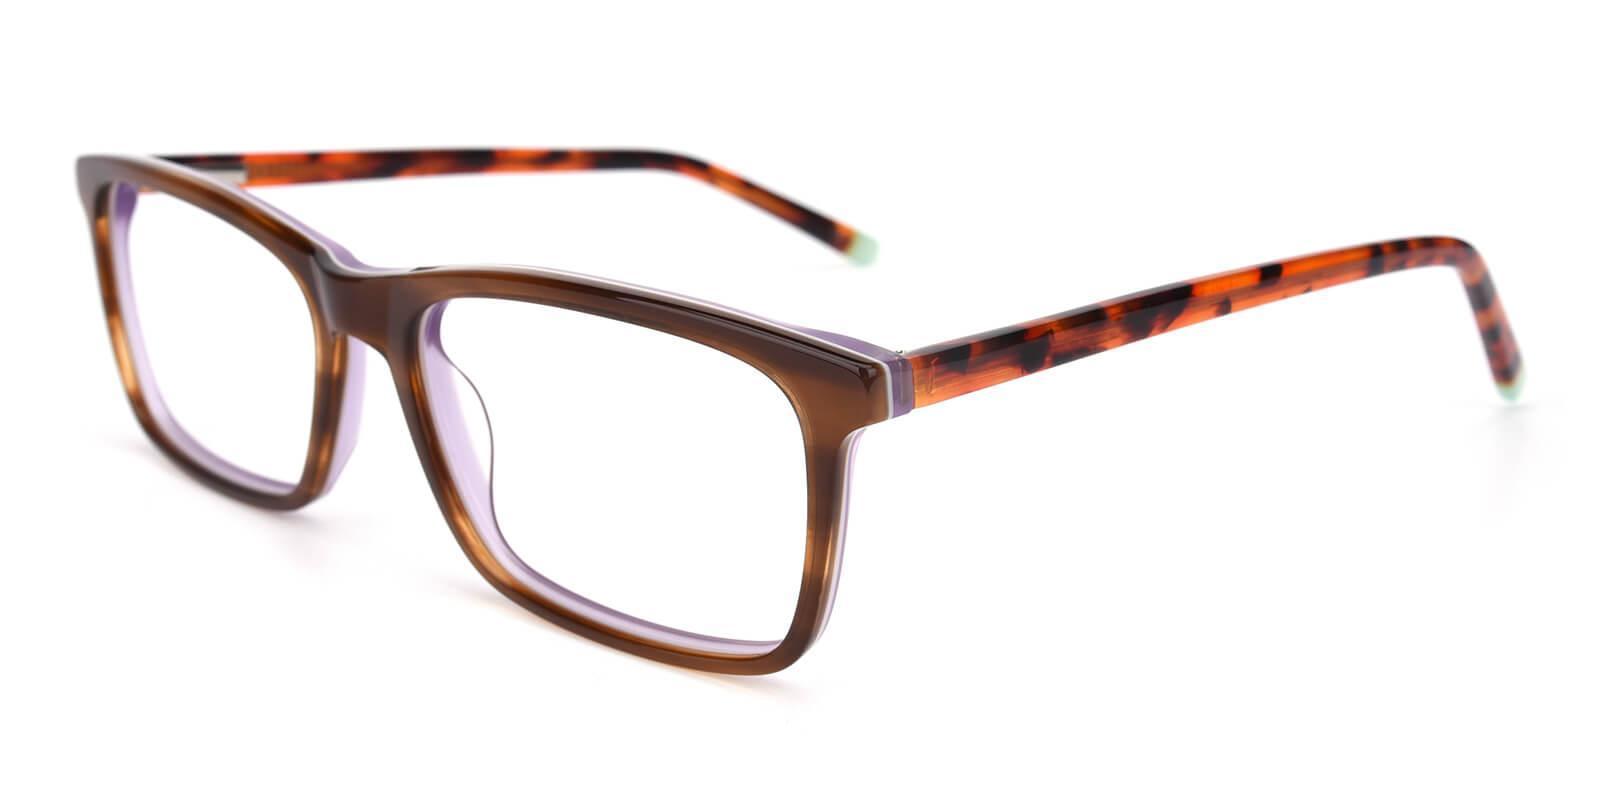 Crane-Tortoise-Rectangle-Acetate-Eyeglasses-additional1